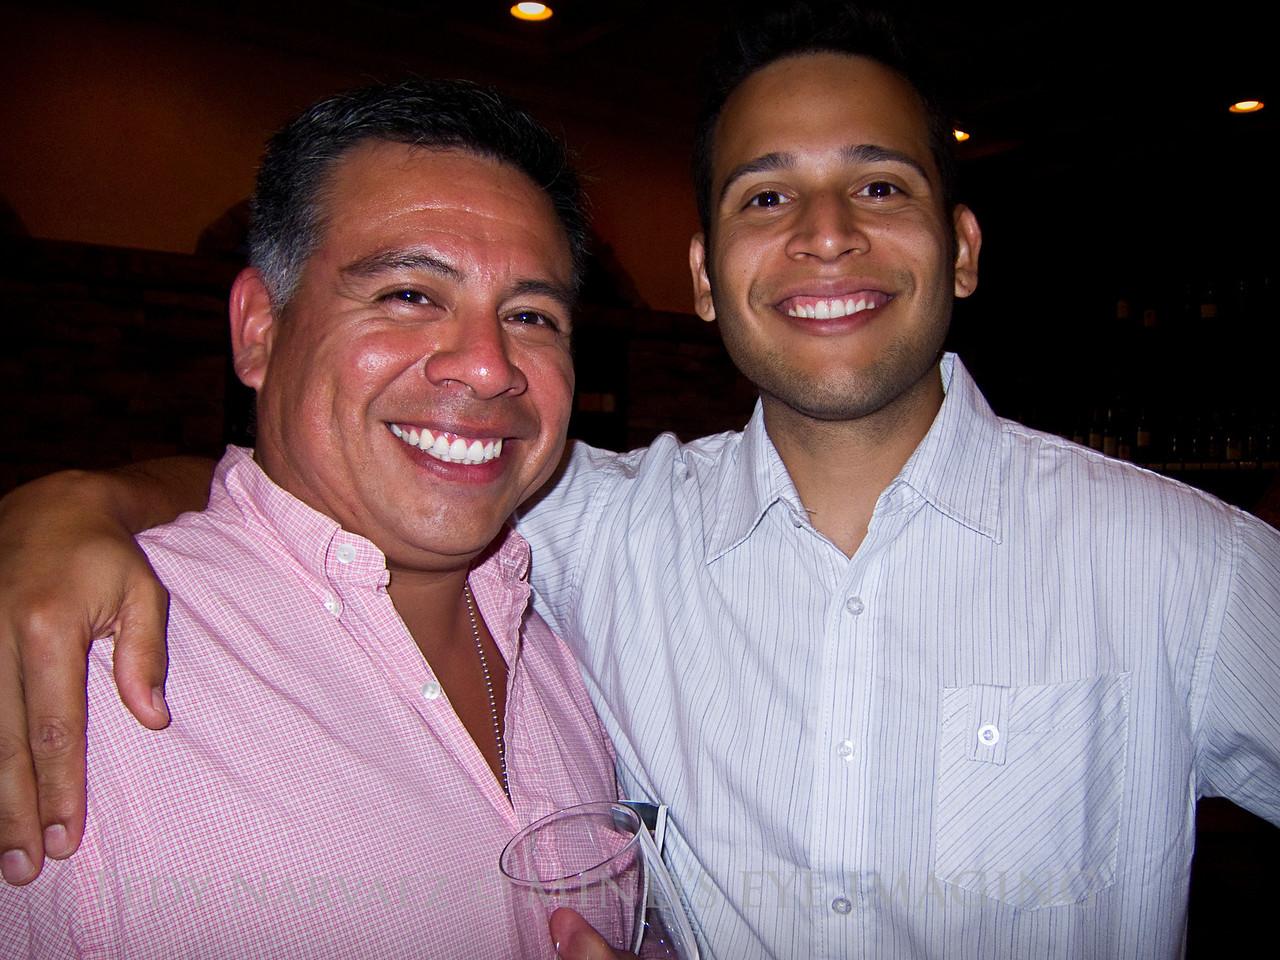 Me & Carlos